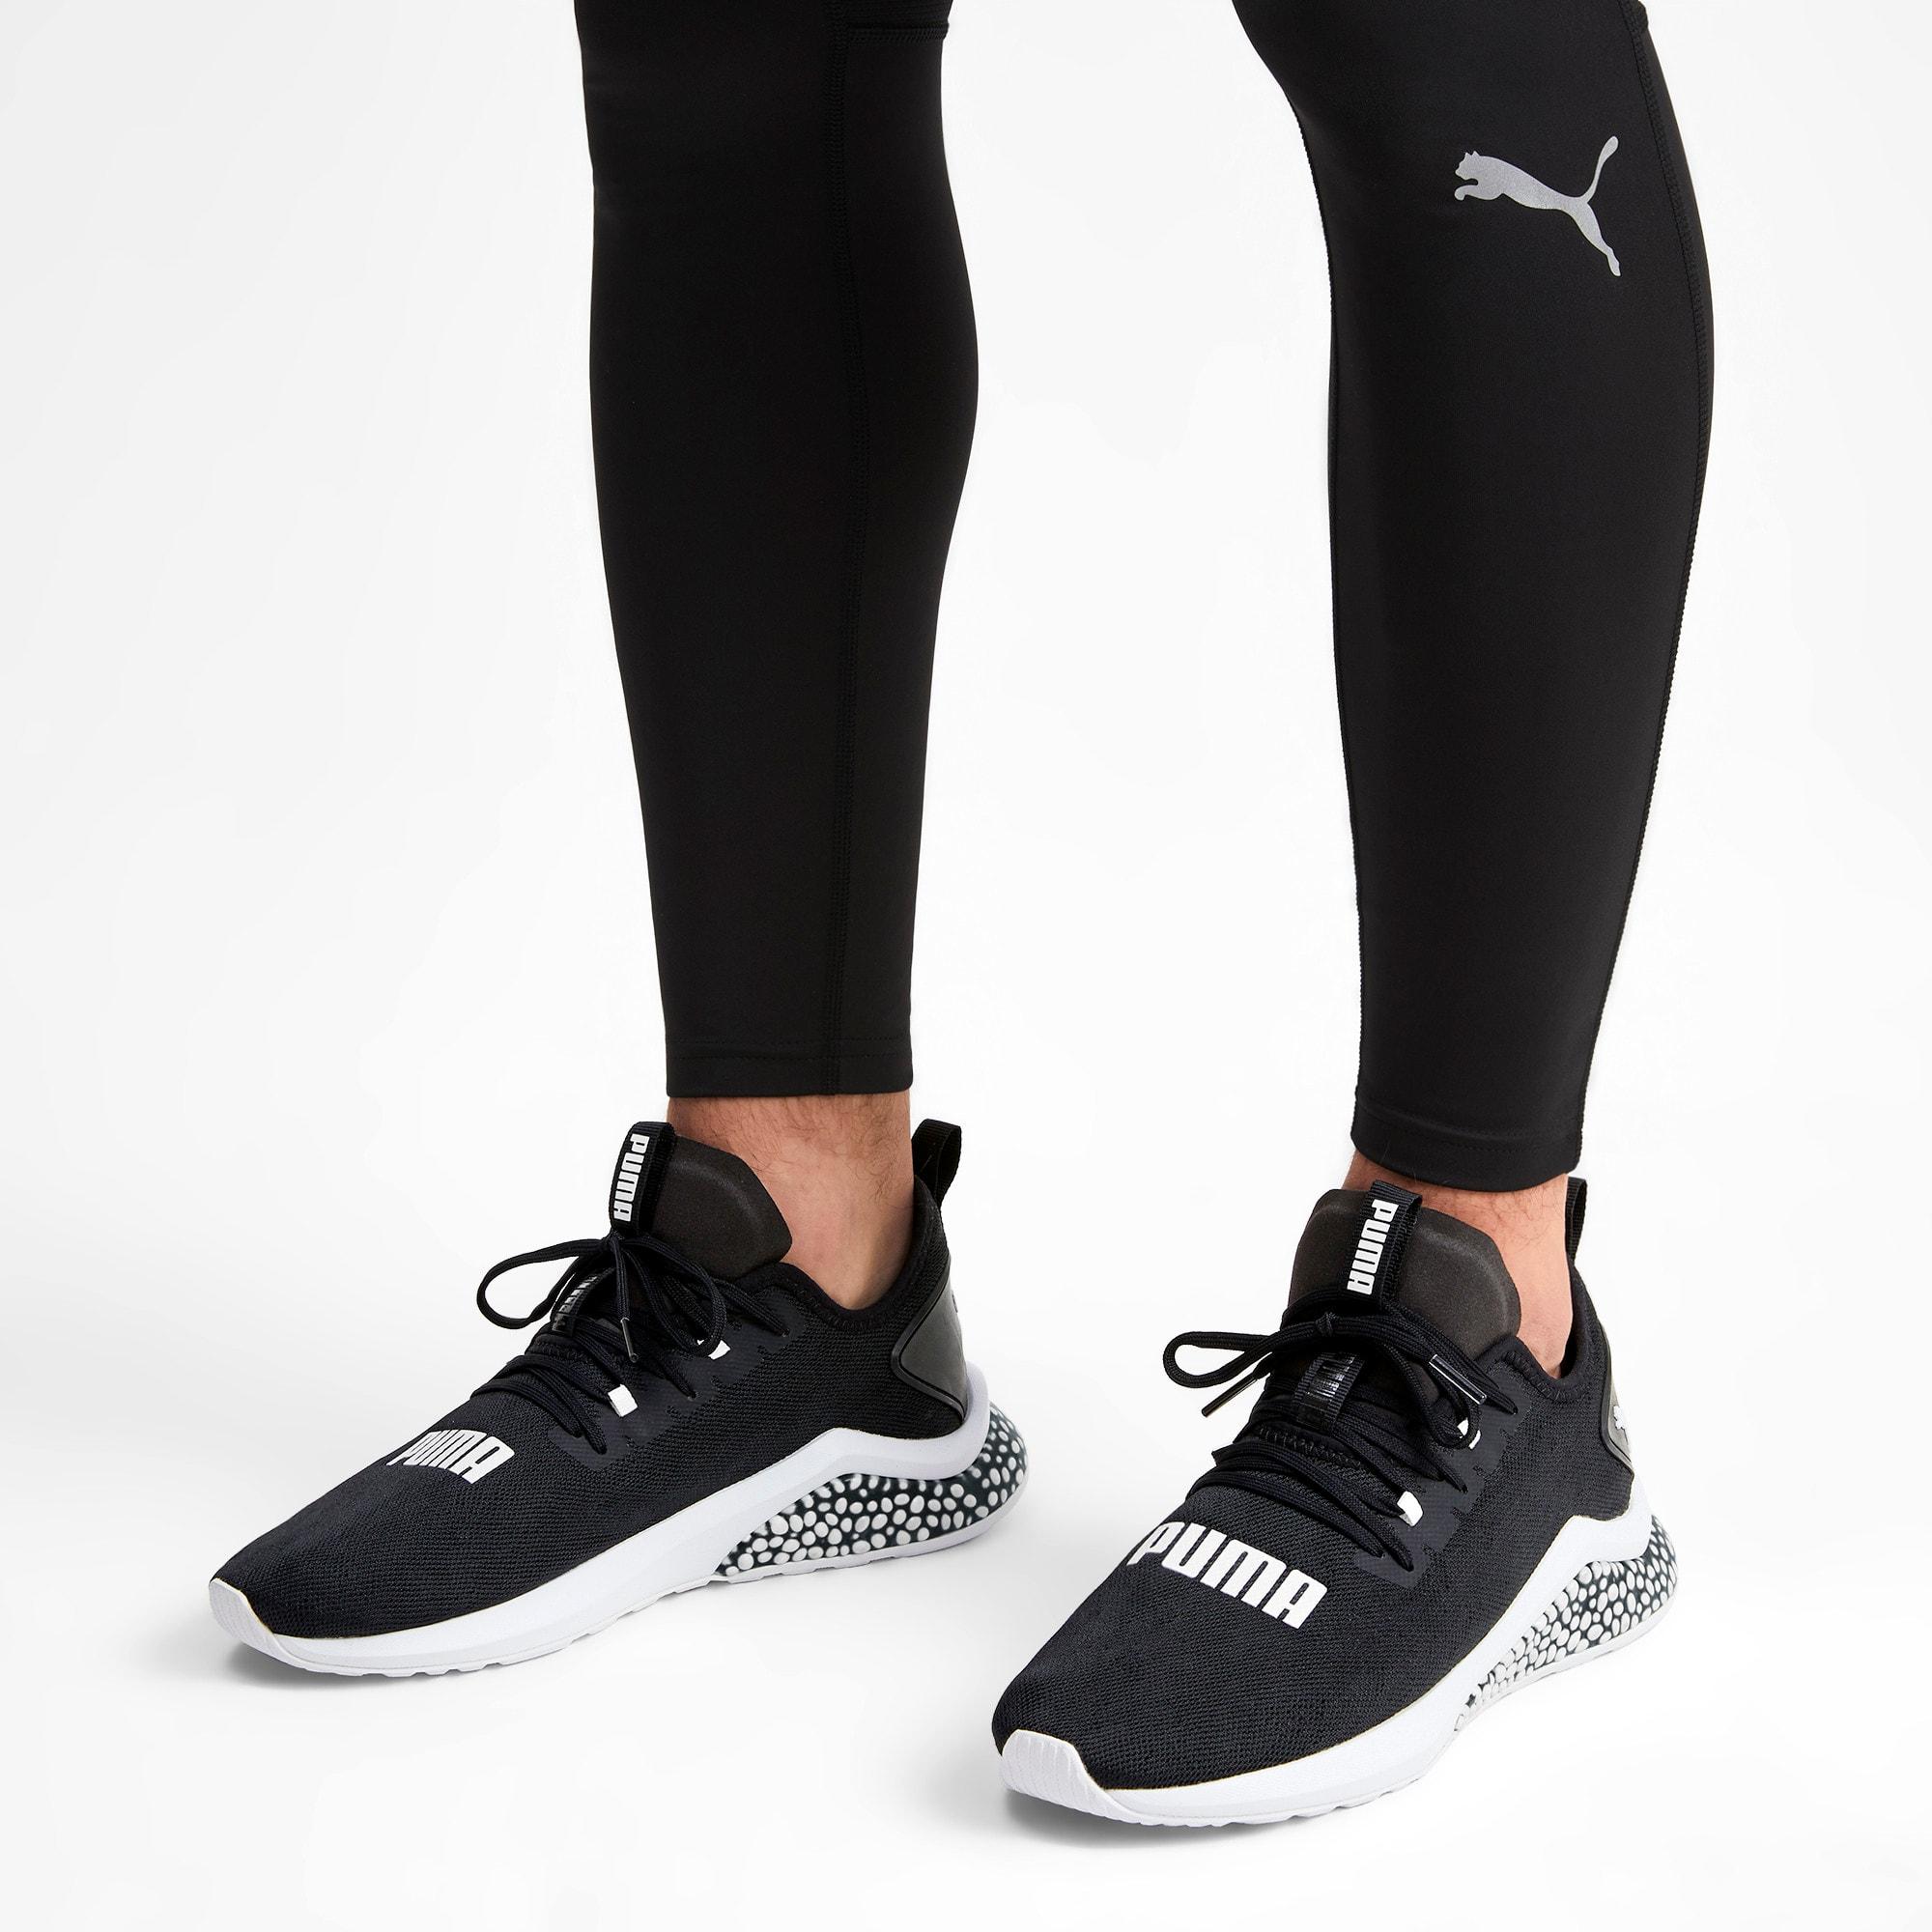 Thumbnail 3 of HYBRID NX Camo Men's Running Shoes, Puma Black-Puma White, medium